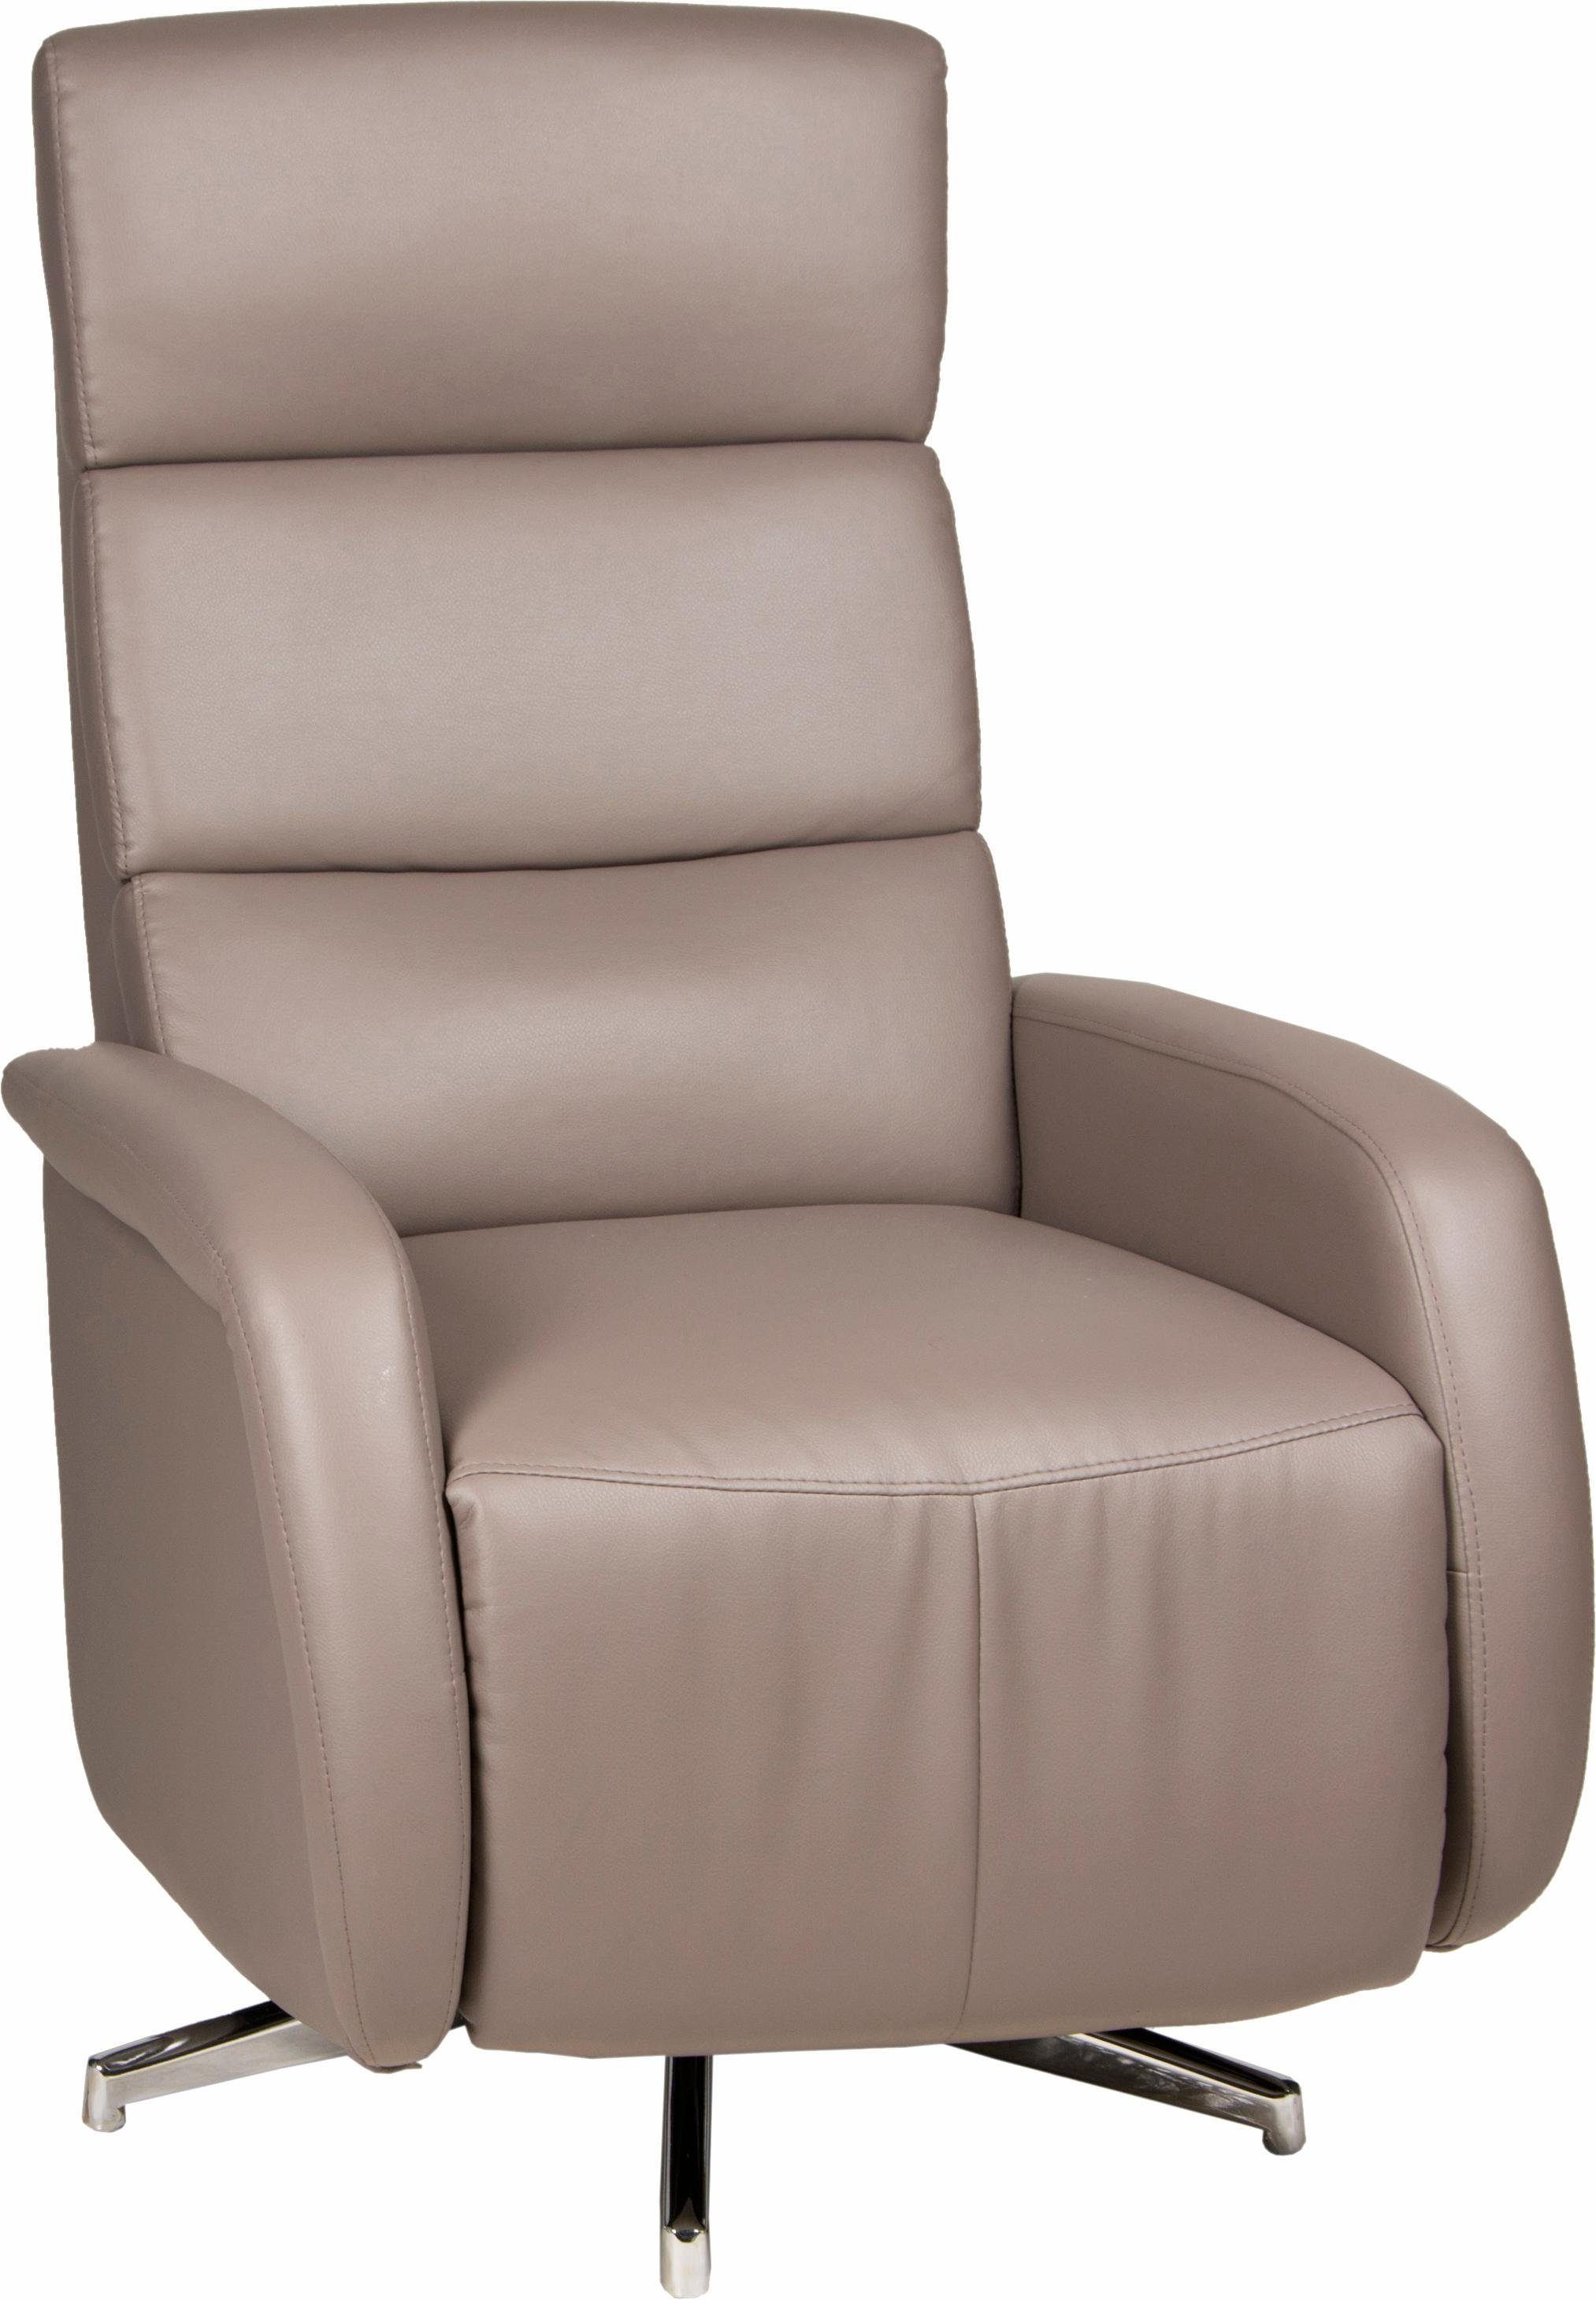 INOSIGN TV-Sessel »Tripoli«, drehbar, mit integrierter Fußstütze